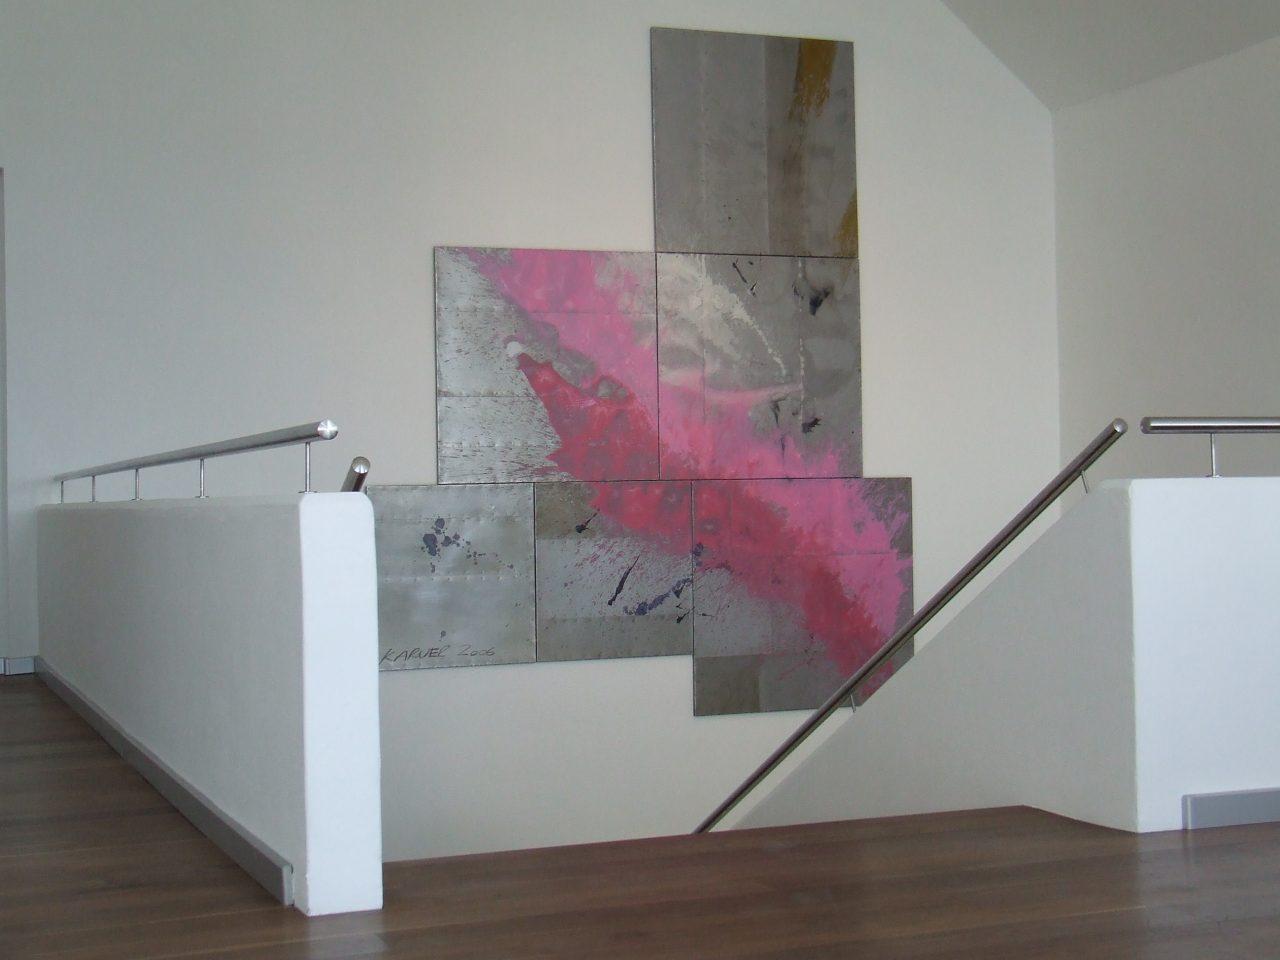 projekt landegger, mischtechnik, öl auf metall, 391x337cm, 2006, 02